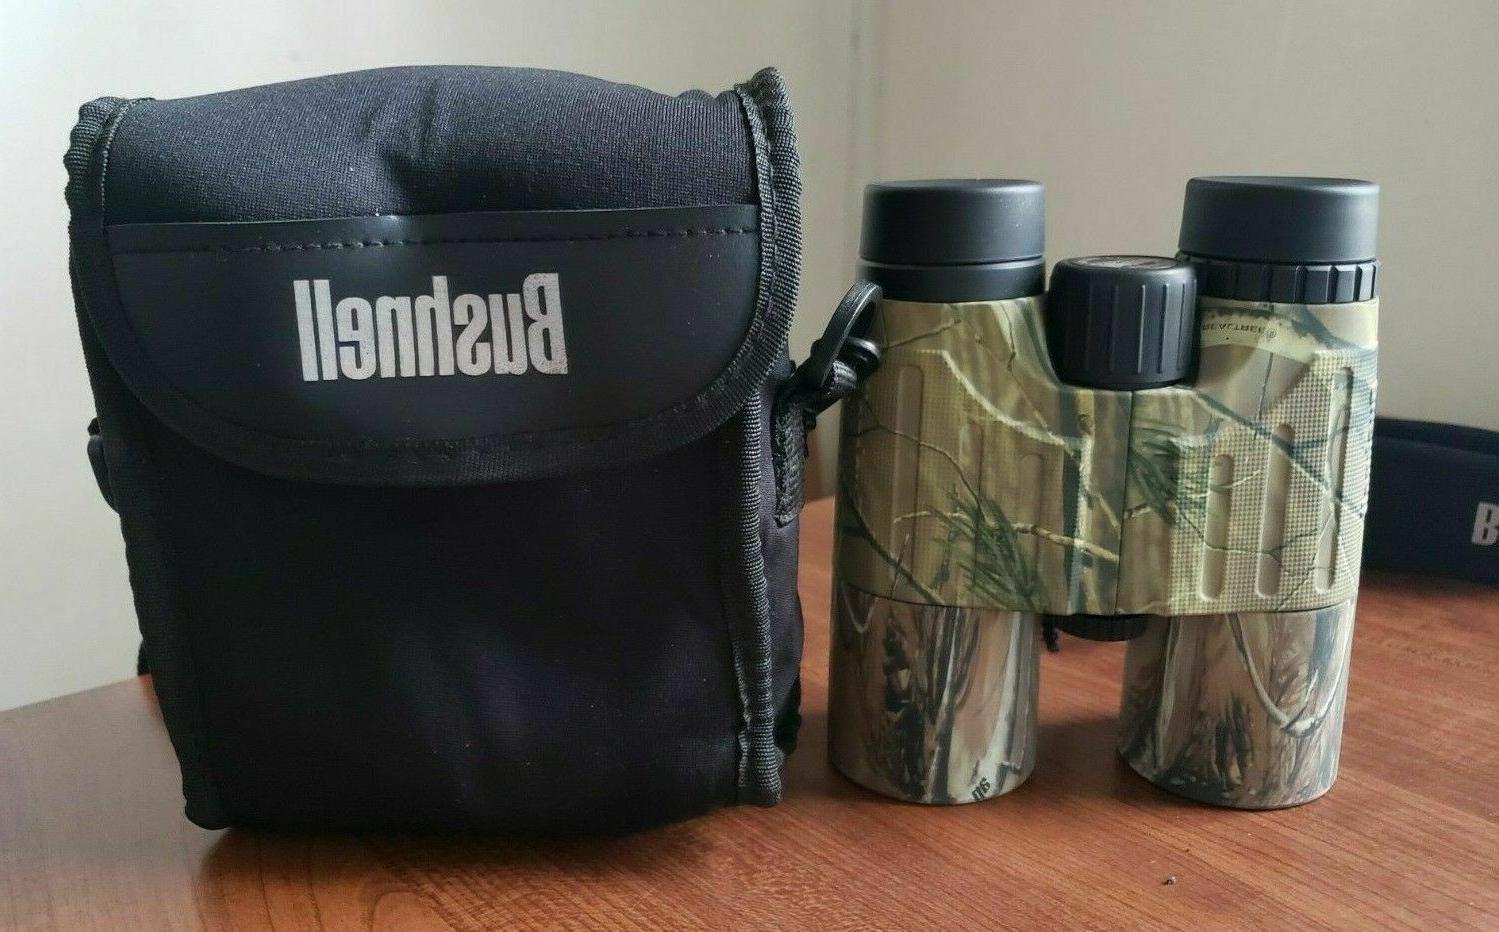 10x42 camo binoculars waterproof fov 304 ft